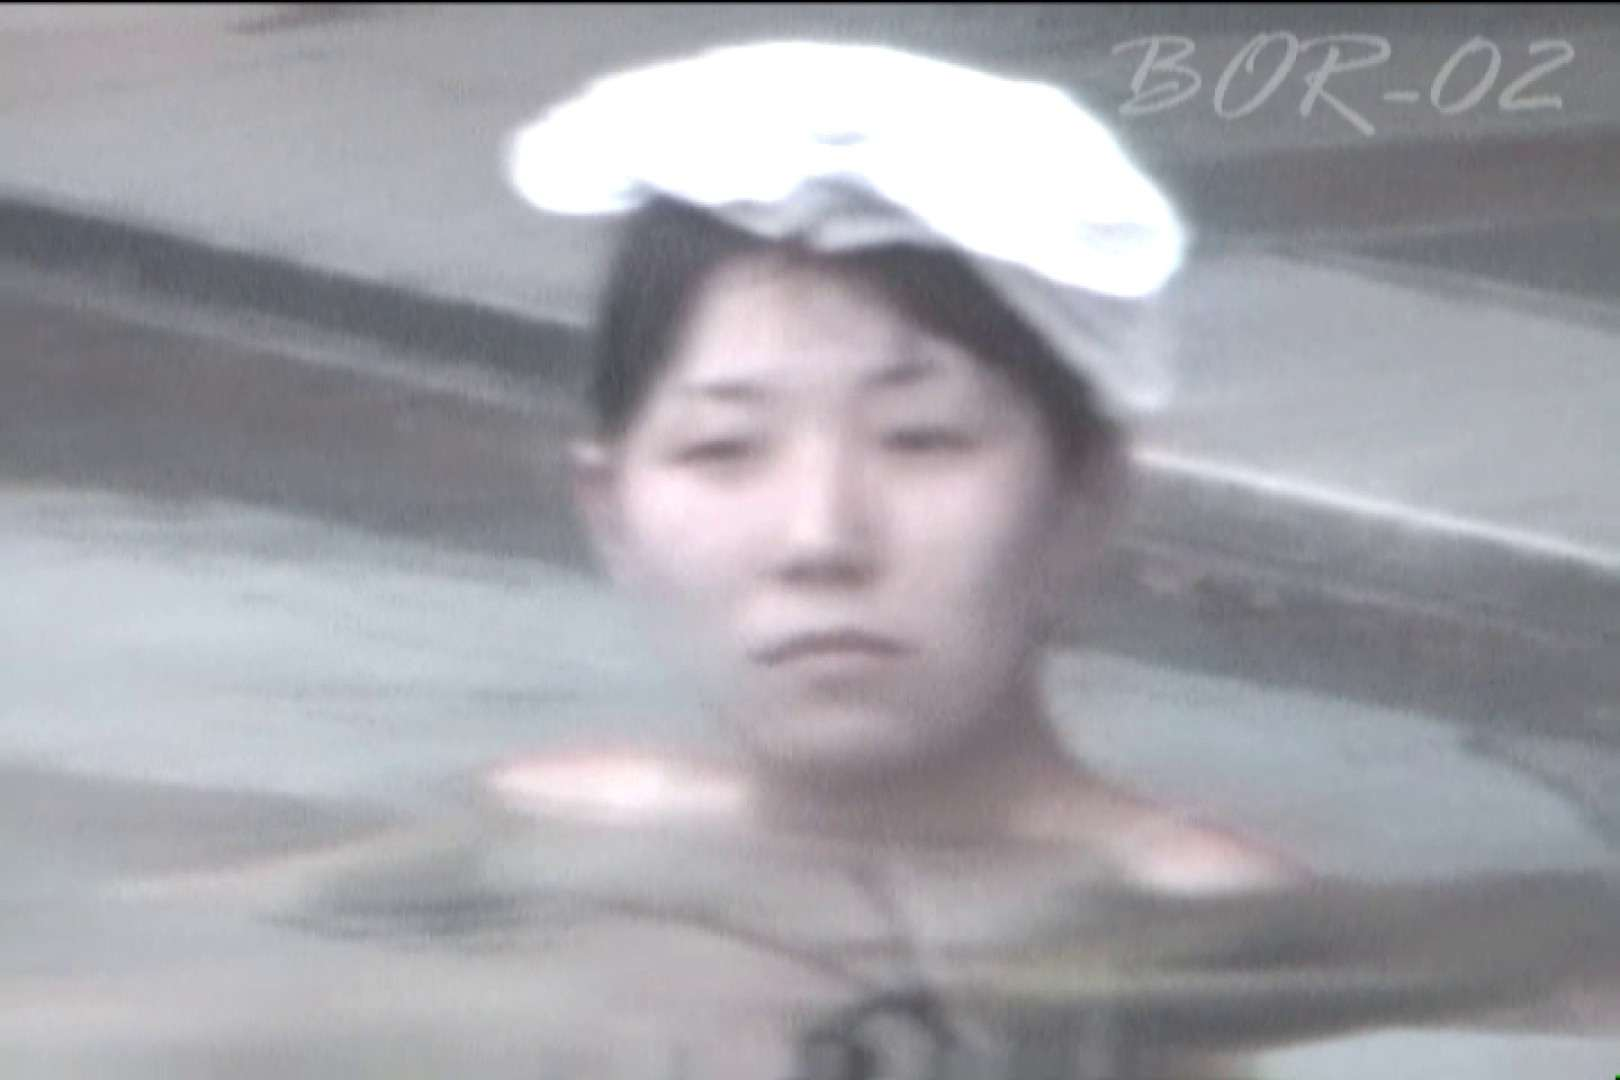 Aquaな露天風呂Vol.475 盗撮師作品  87pic 21